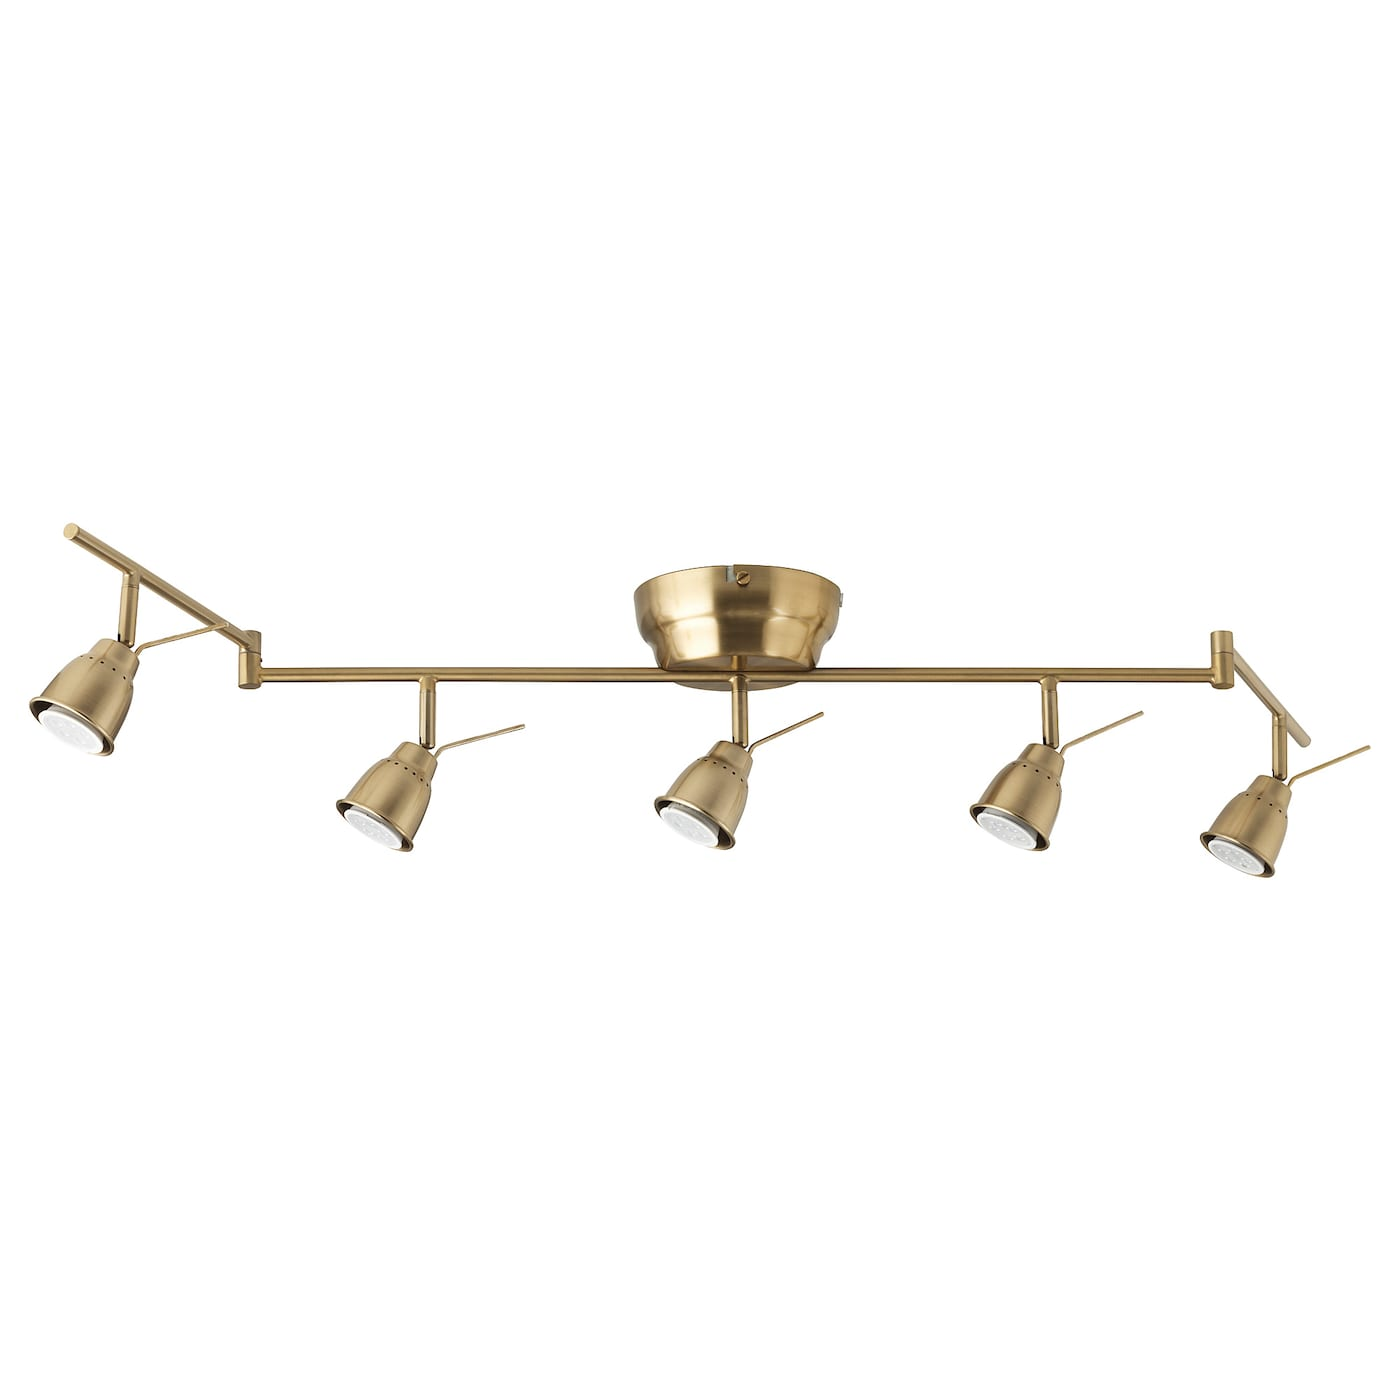 barometer rail plafond 5 spots couleur laiton ikea. Black Bedroom Furniture Sets. Home Design Ideas